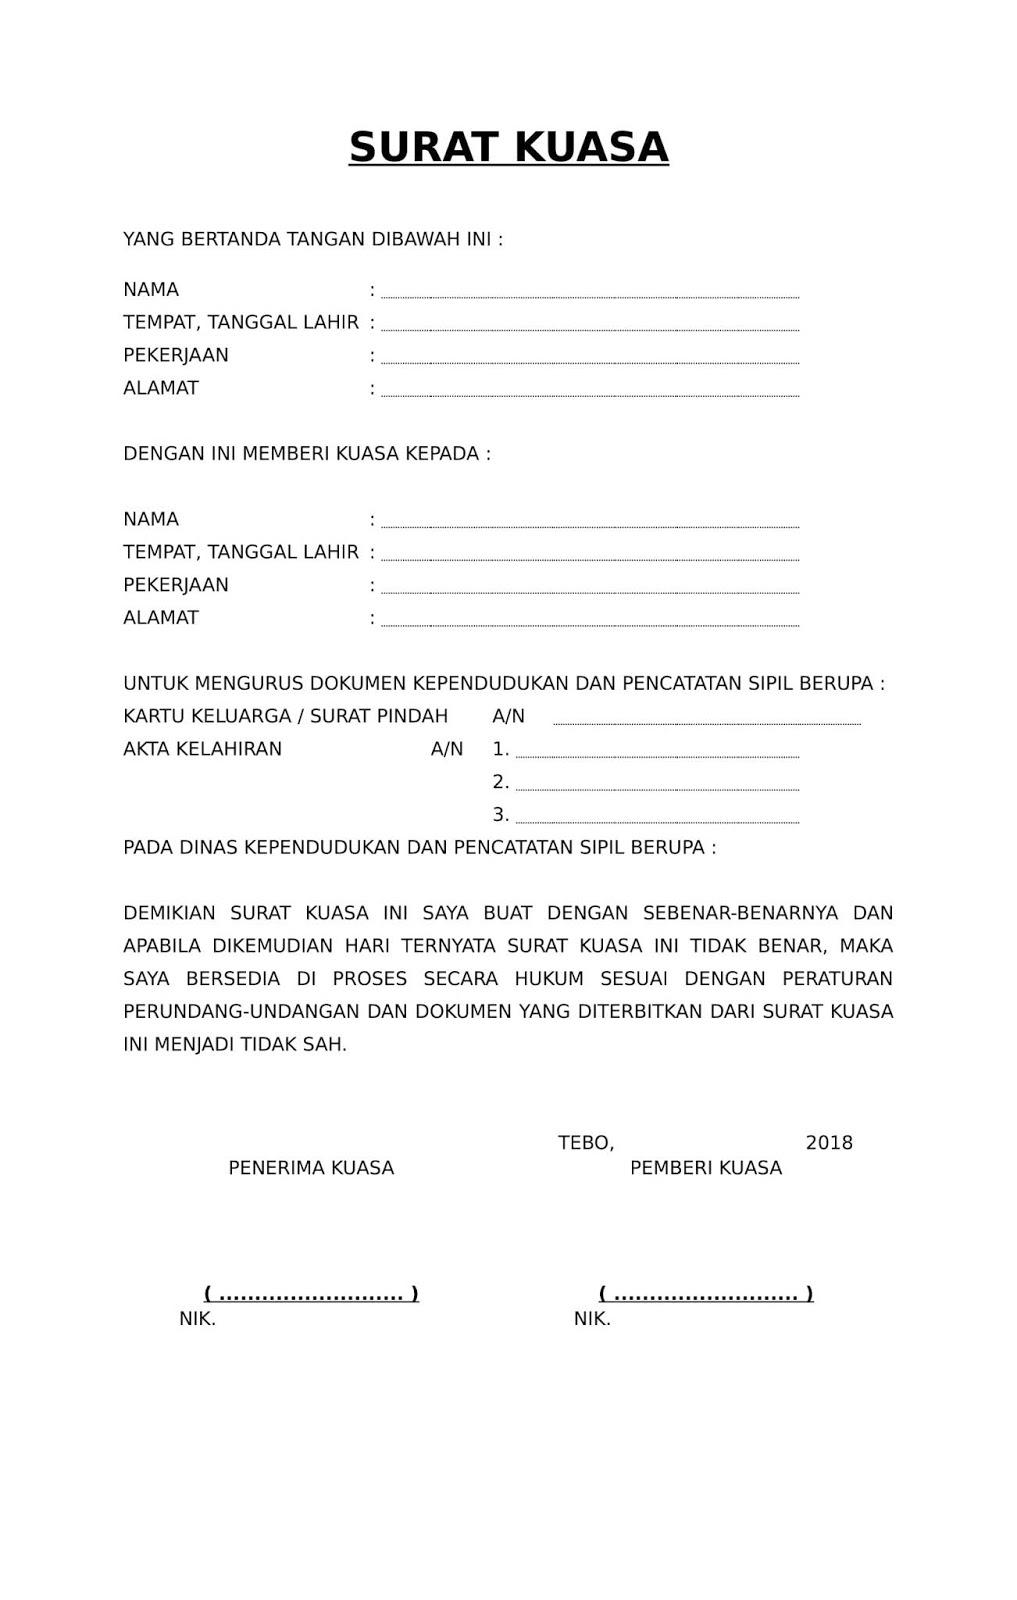 Akta Download Contoh Surat Kuasa Pengurusan Dokumen